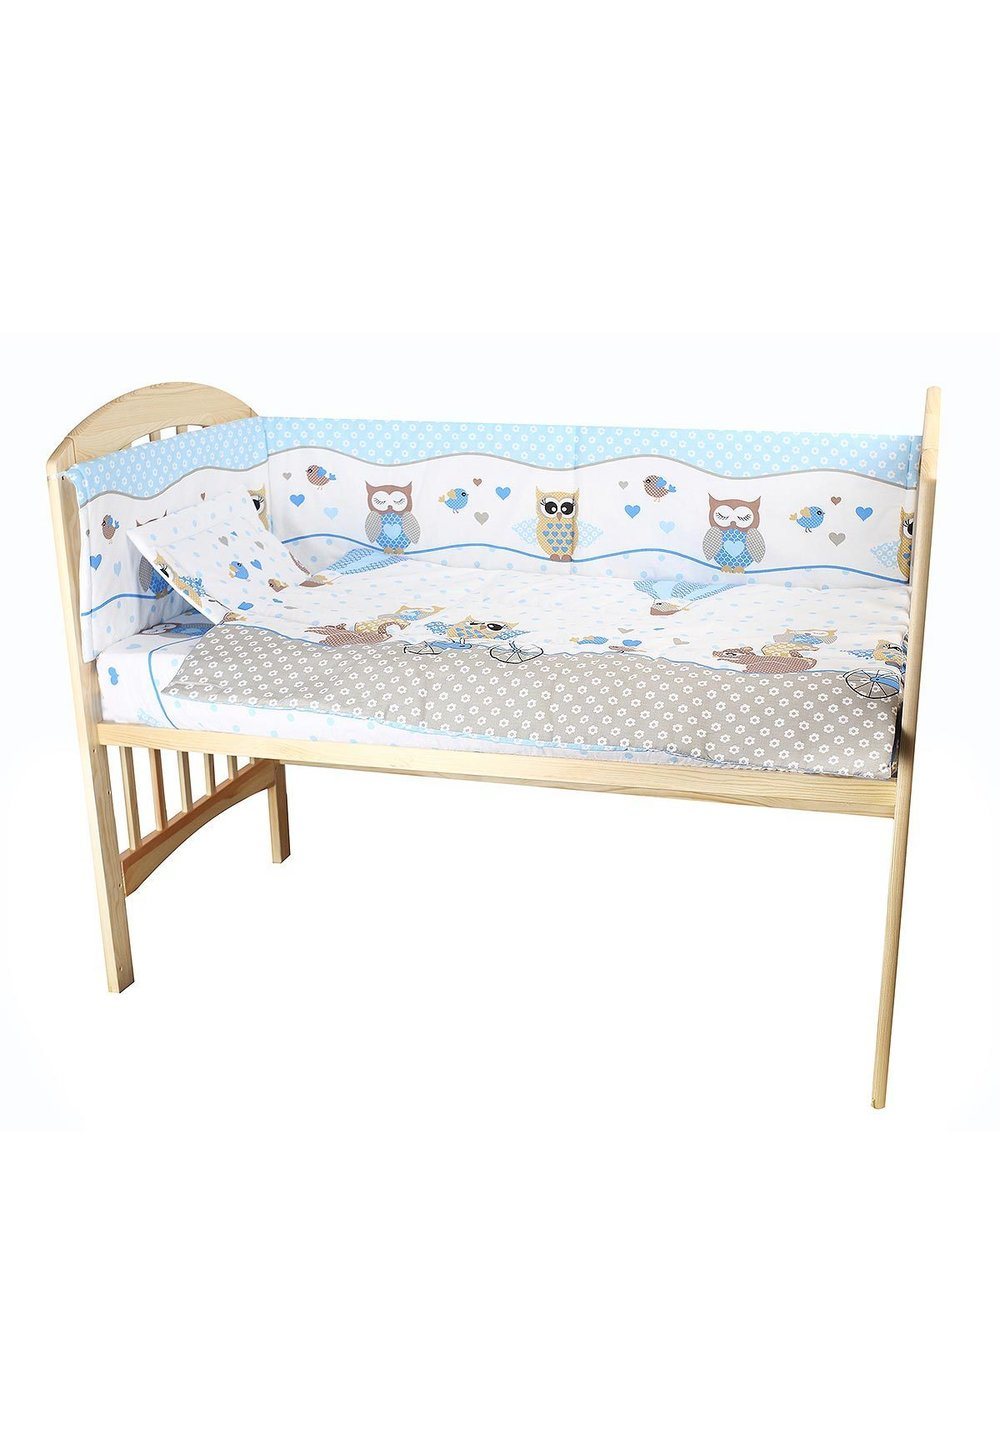 Lenjerie patut, 5 piese, Bufinite albastre, 120 x 60 cm imagine